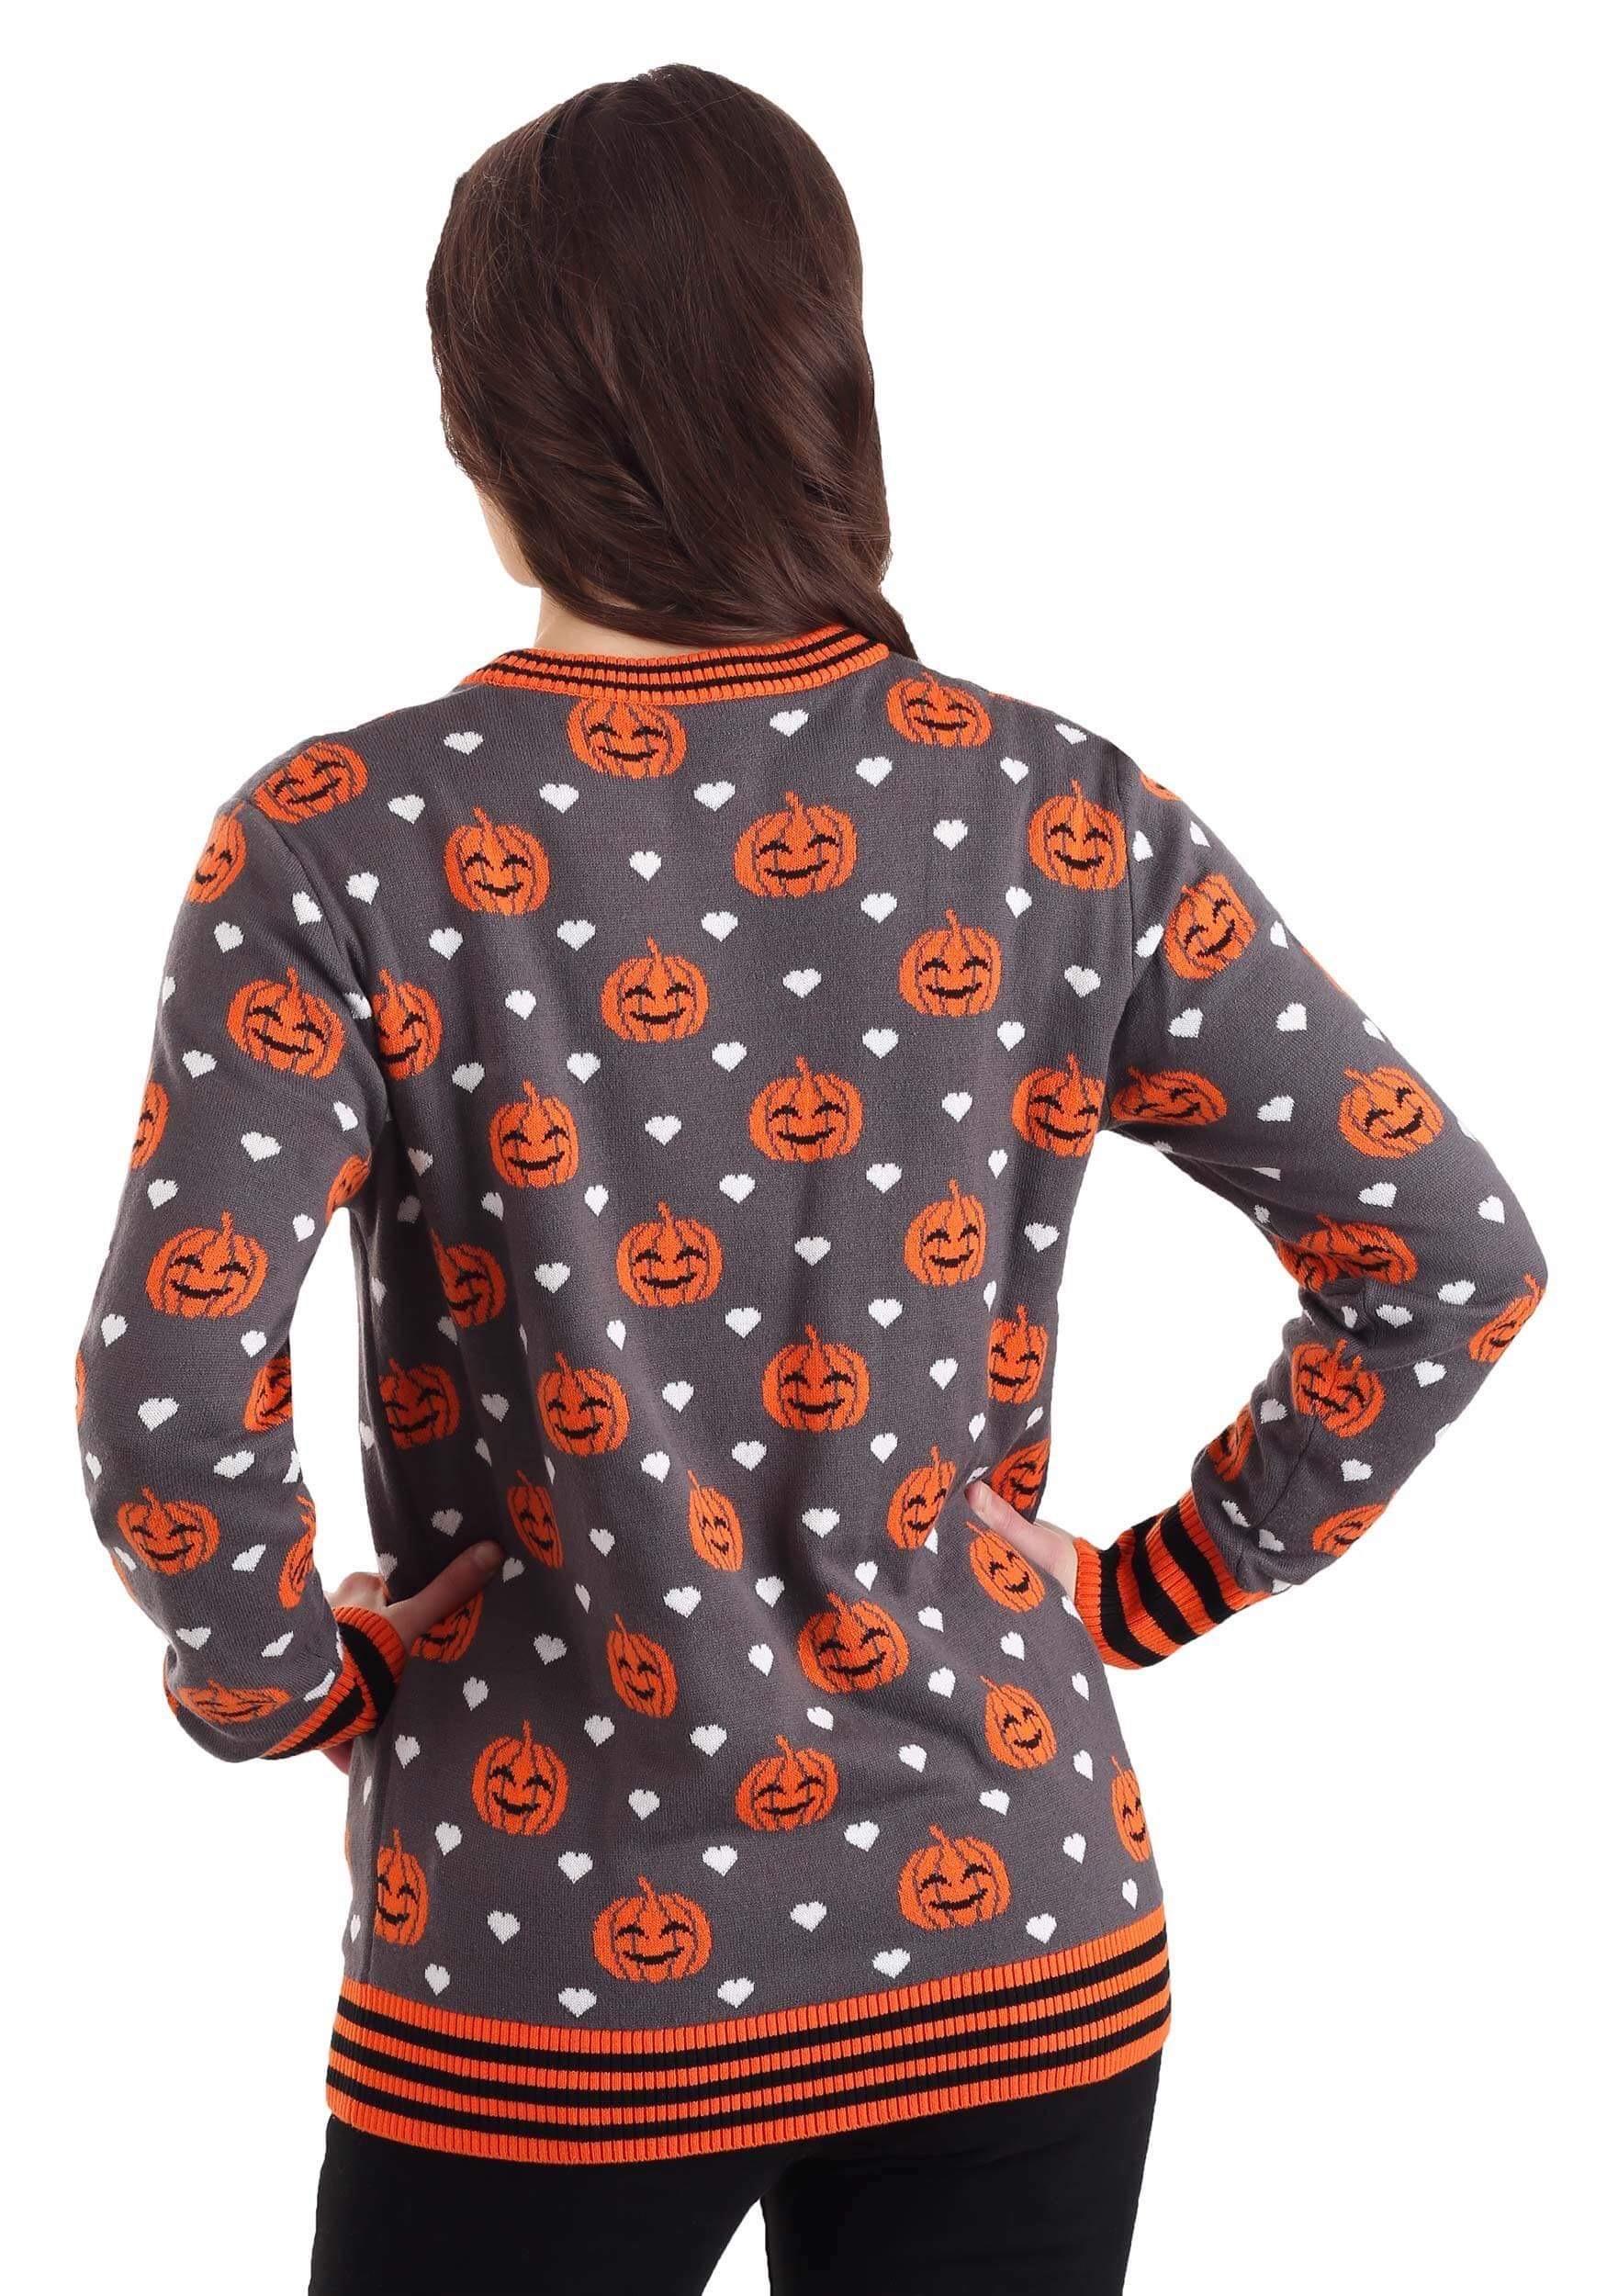 halloween sweaters from HalloweenCostumes.com